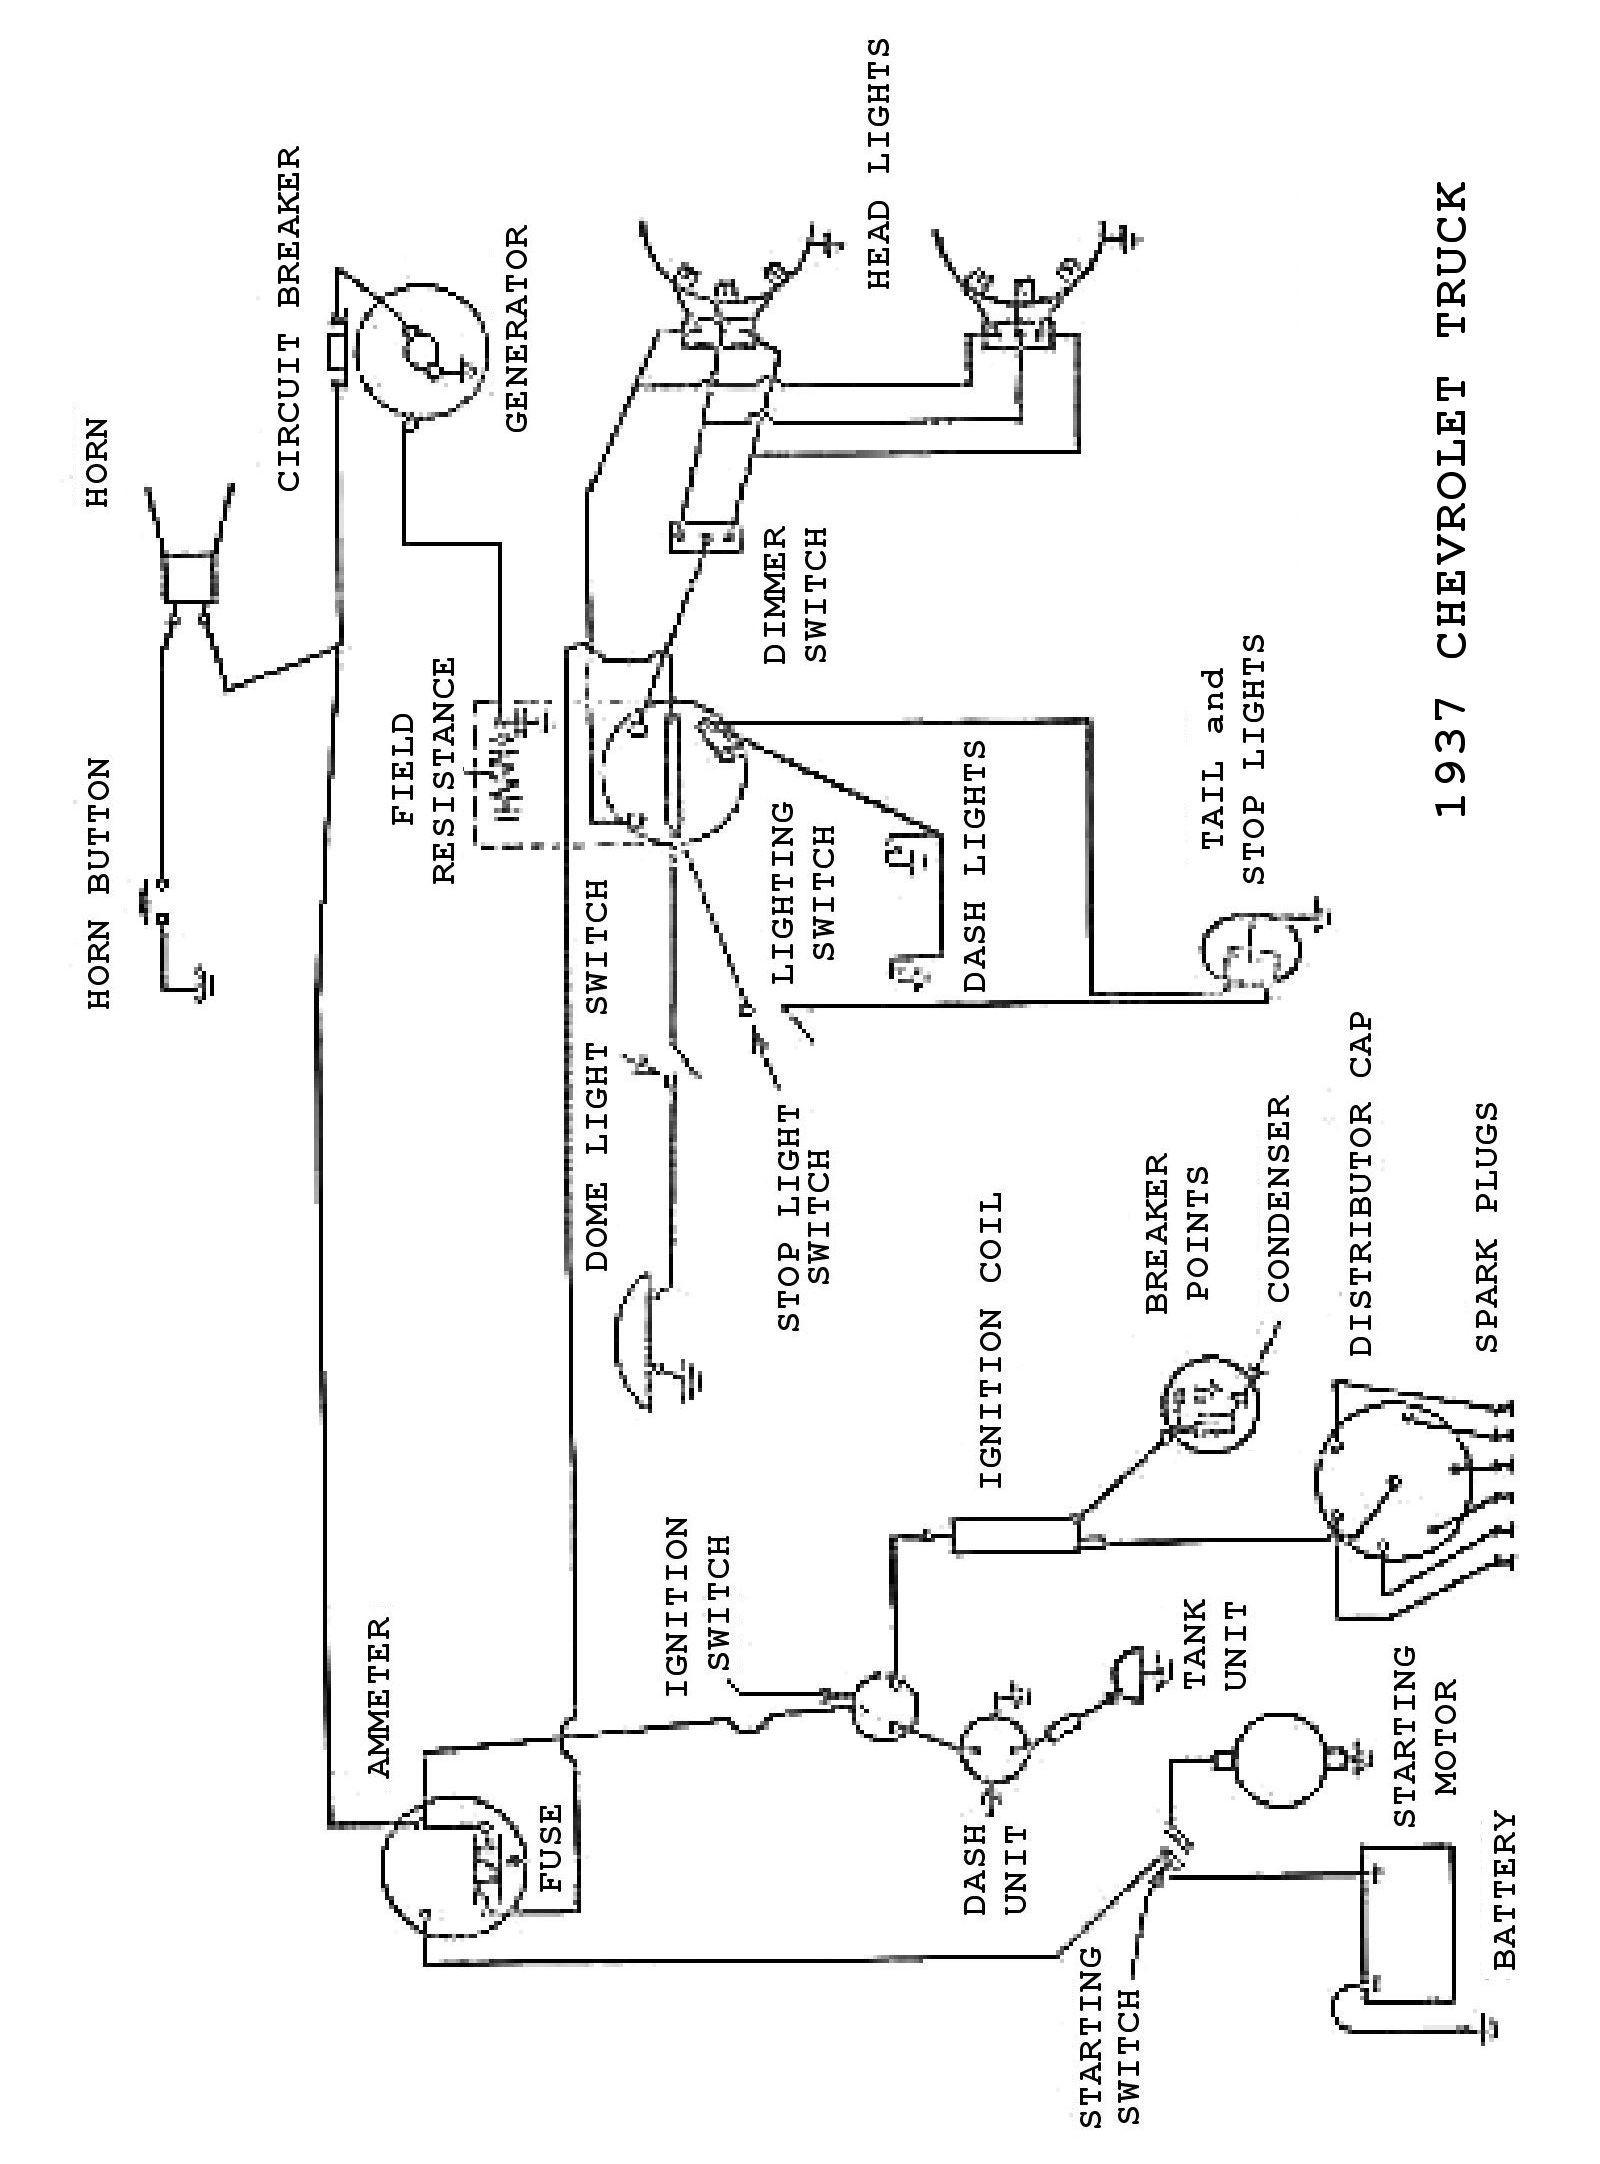 Headlight Switch Wiring Diagram Chevy Truck Chevy Wiring Diagrams Of Headlight Switch Wiring Diagram Chevy Truck